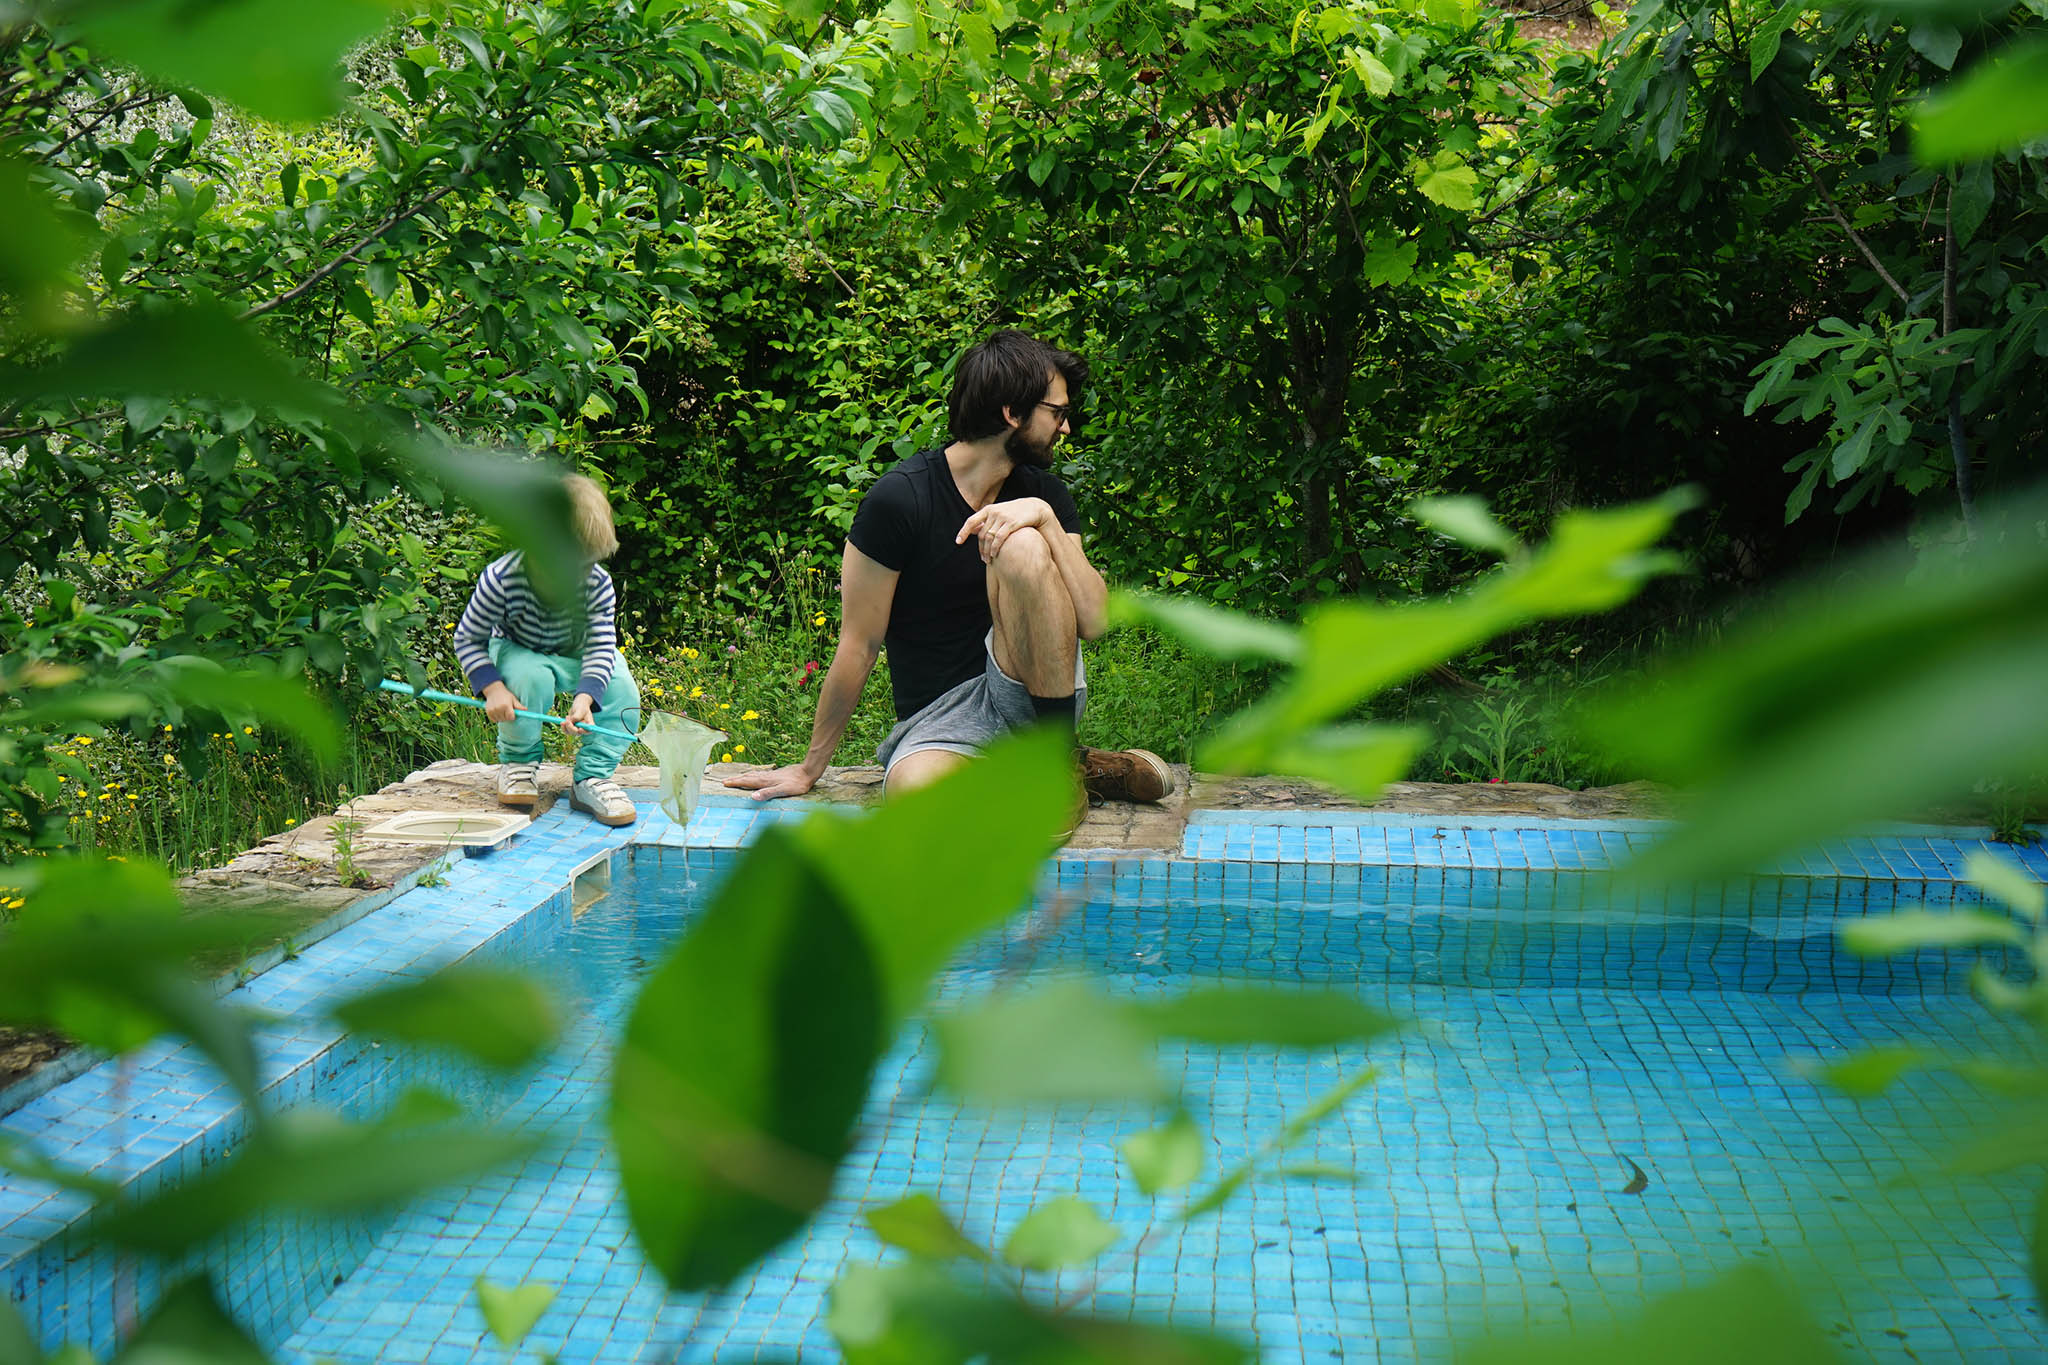 2017-04-Casas-da-Cerca-Portugal - casas-da-cerca-portugal-nectarandpulse-pool-35.jpg